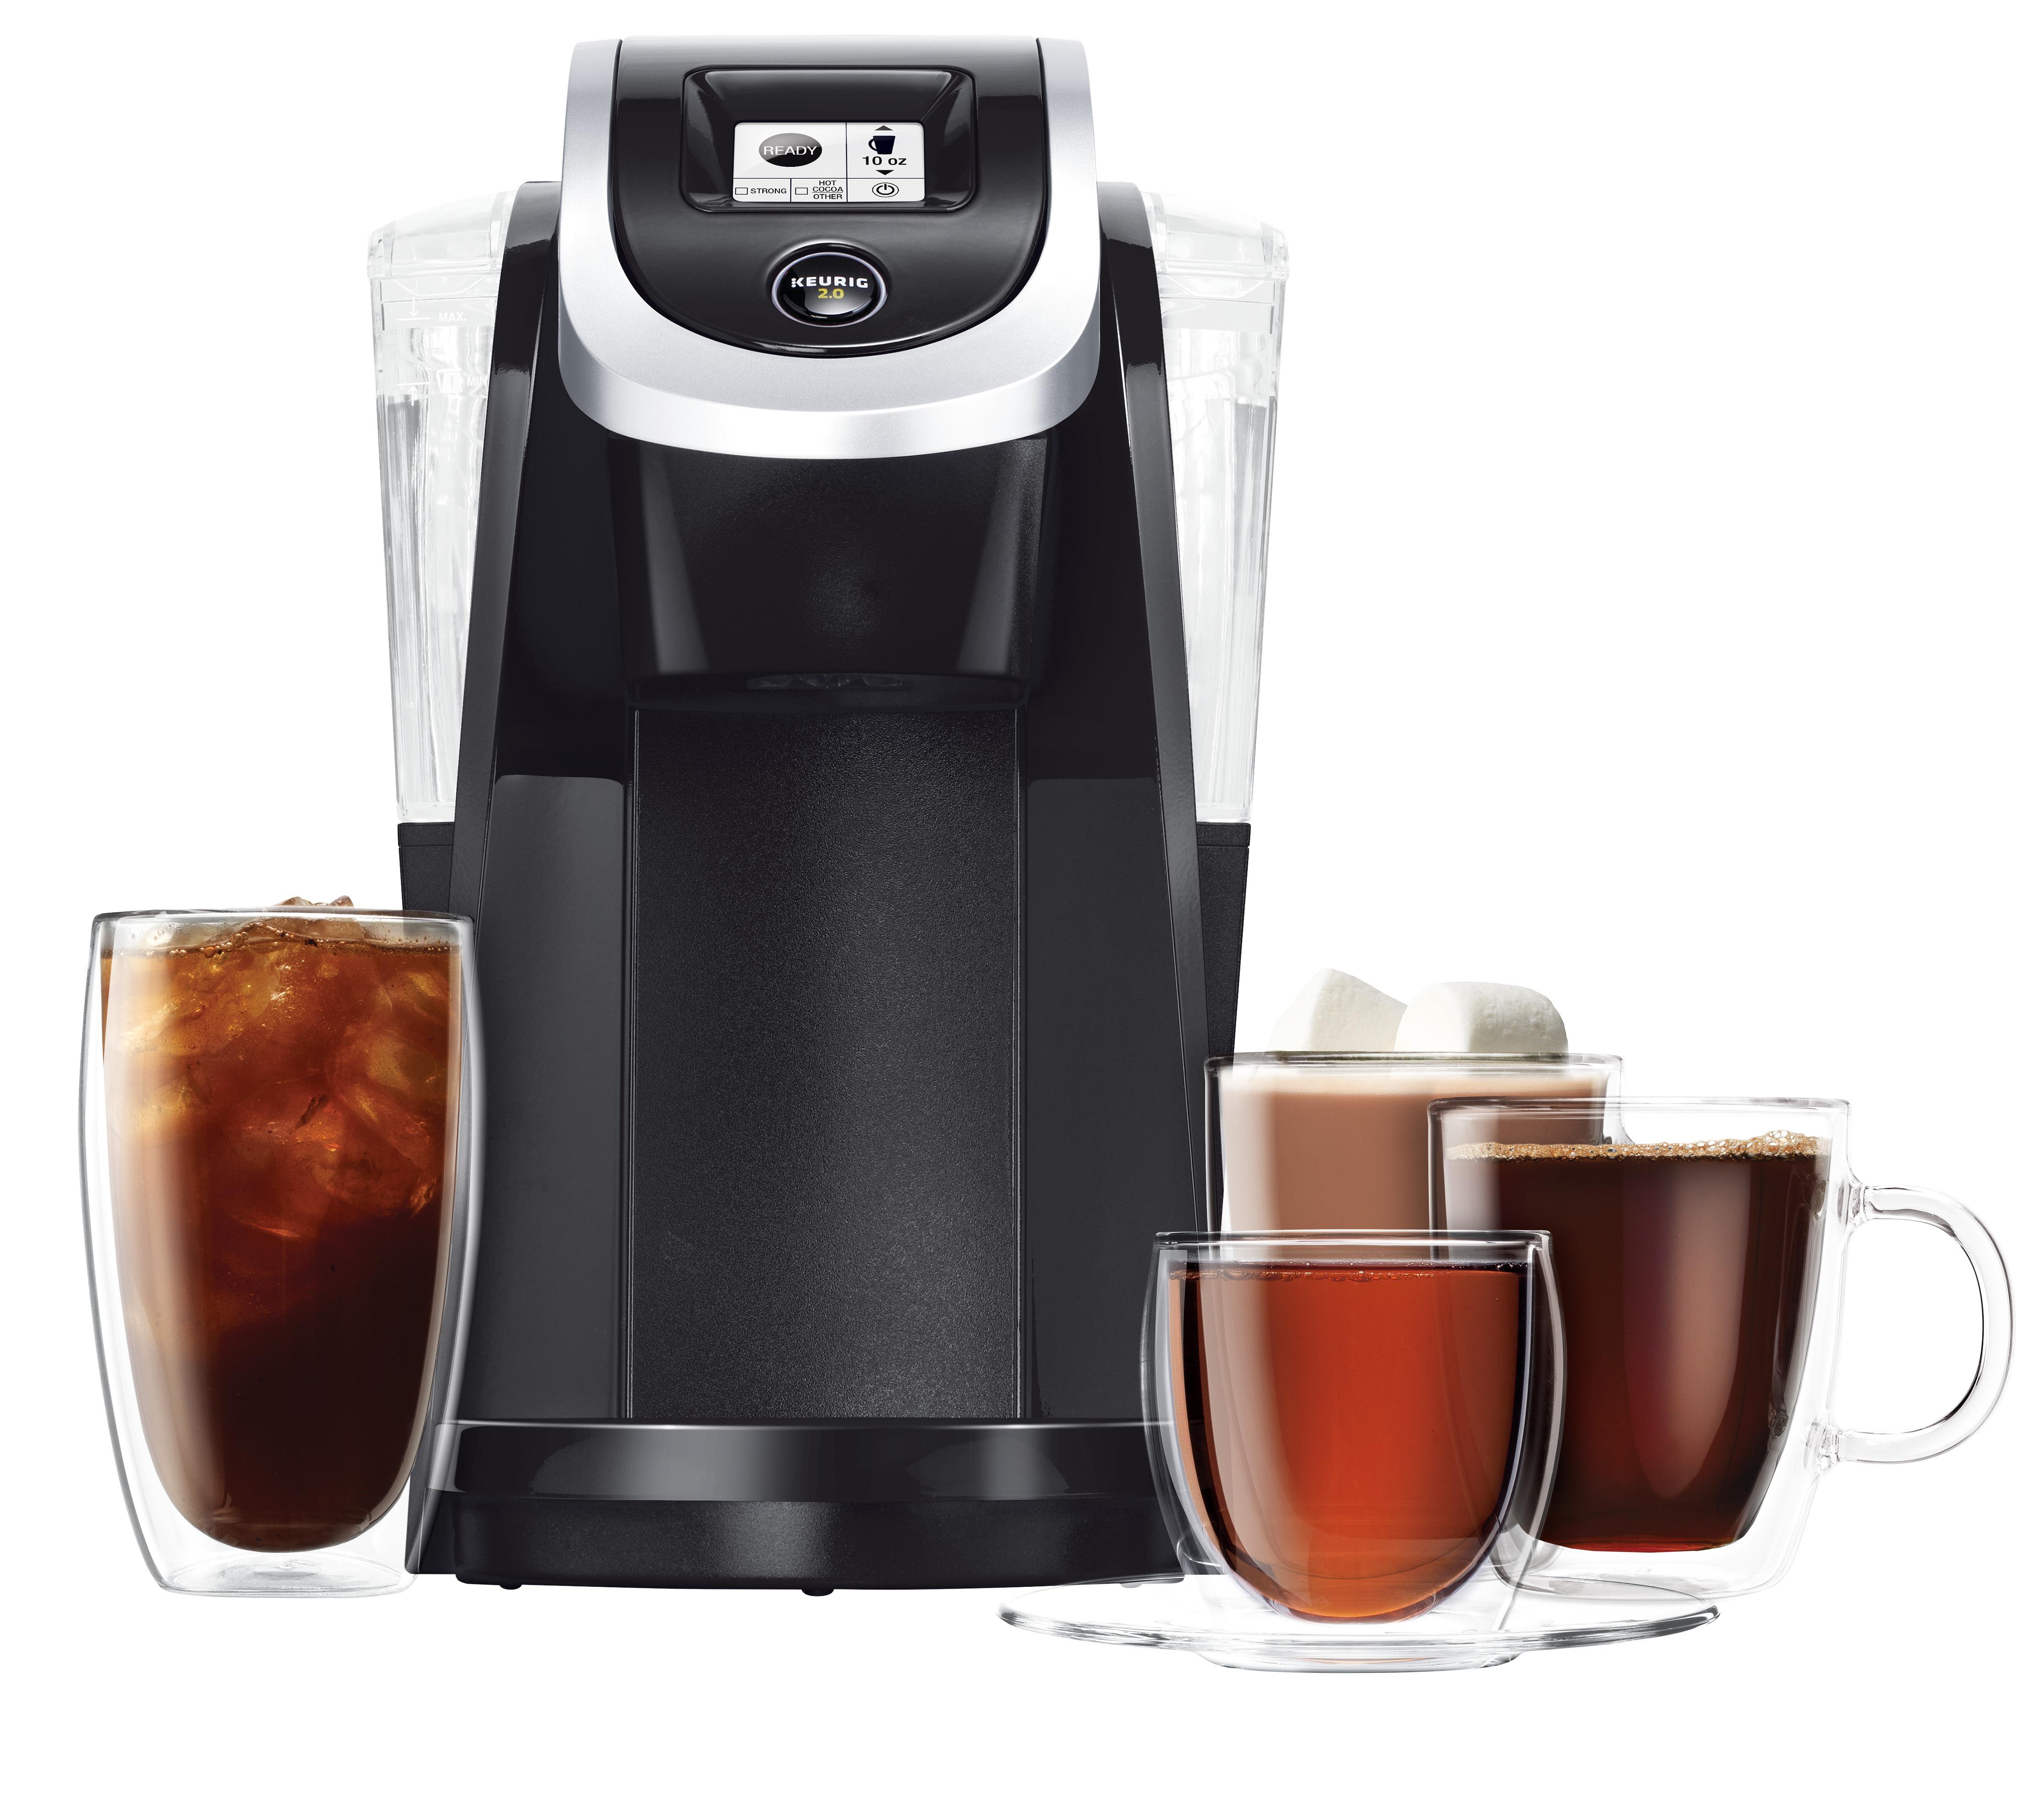 Keurig K200 Single Serve K Cup Pod Coffee Maker Ymmv 4999